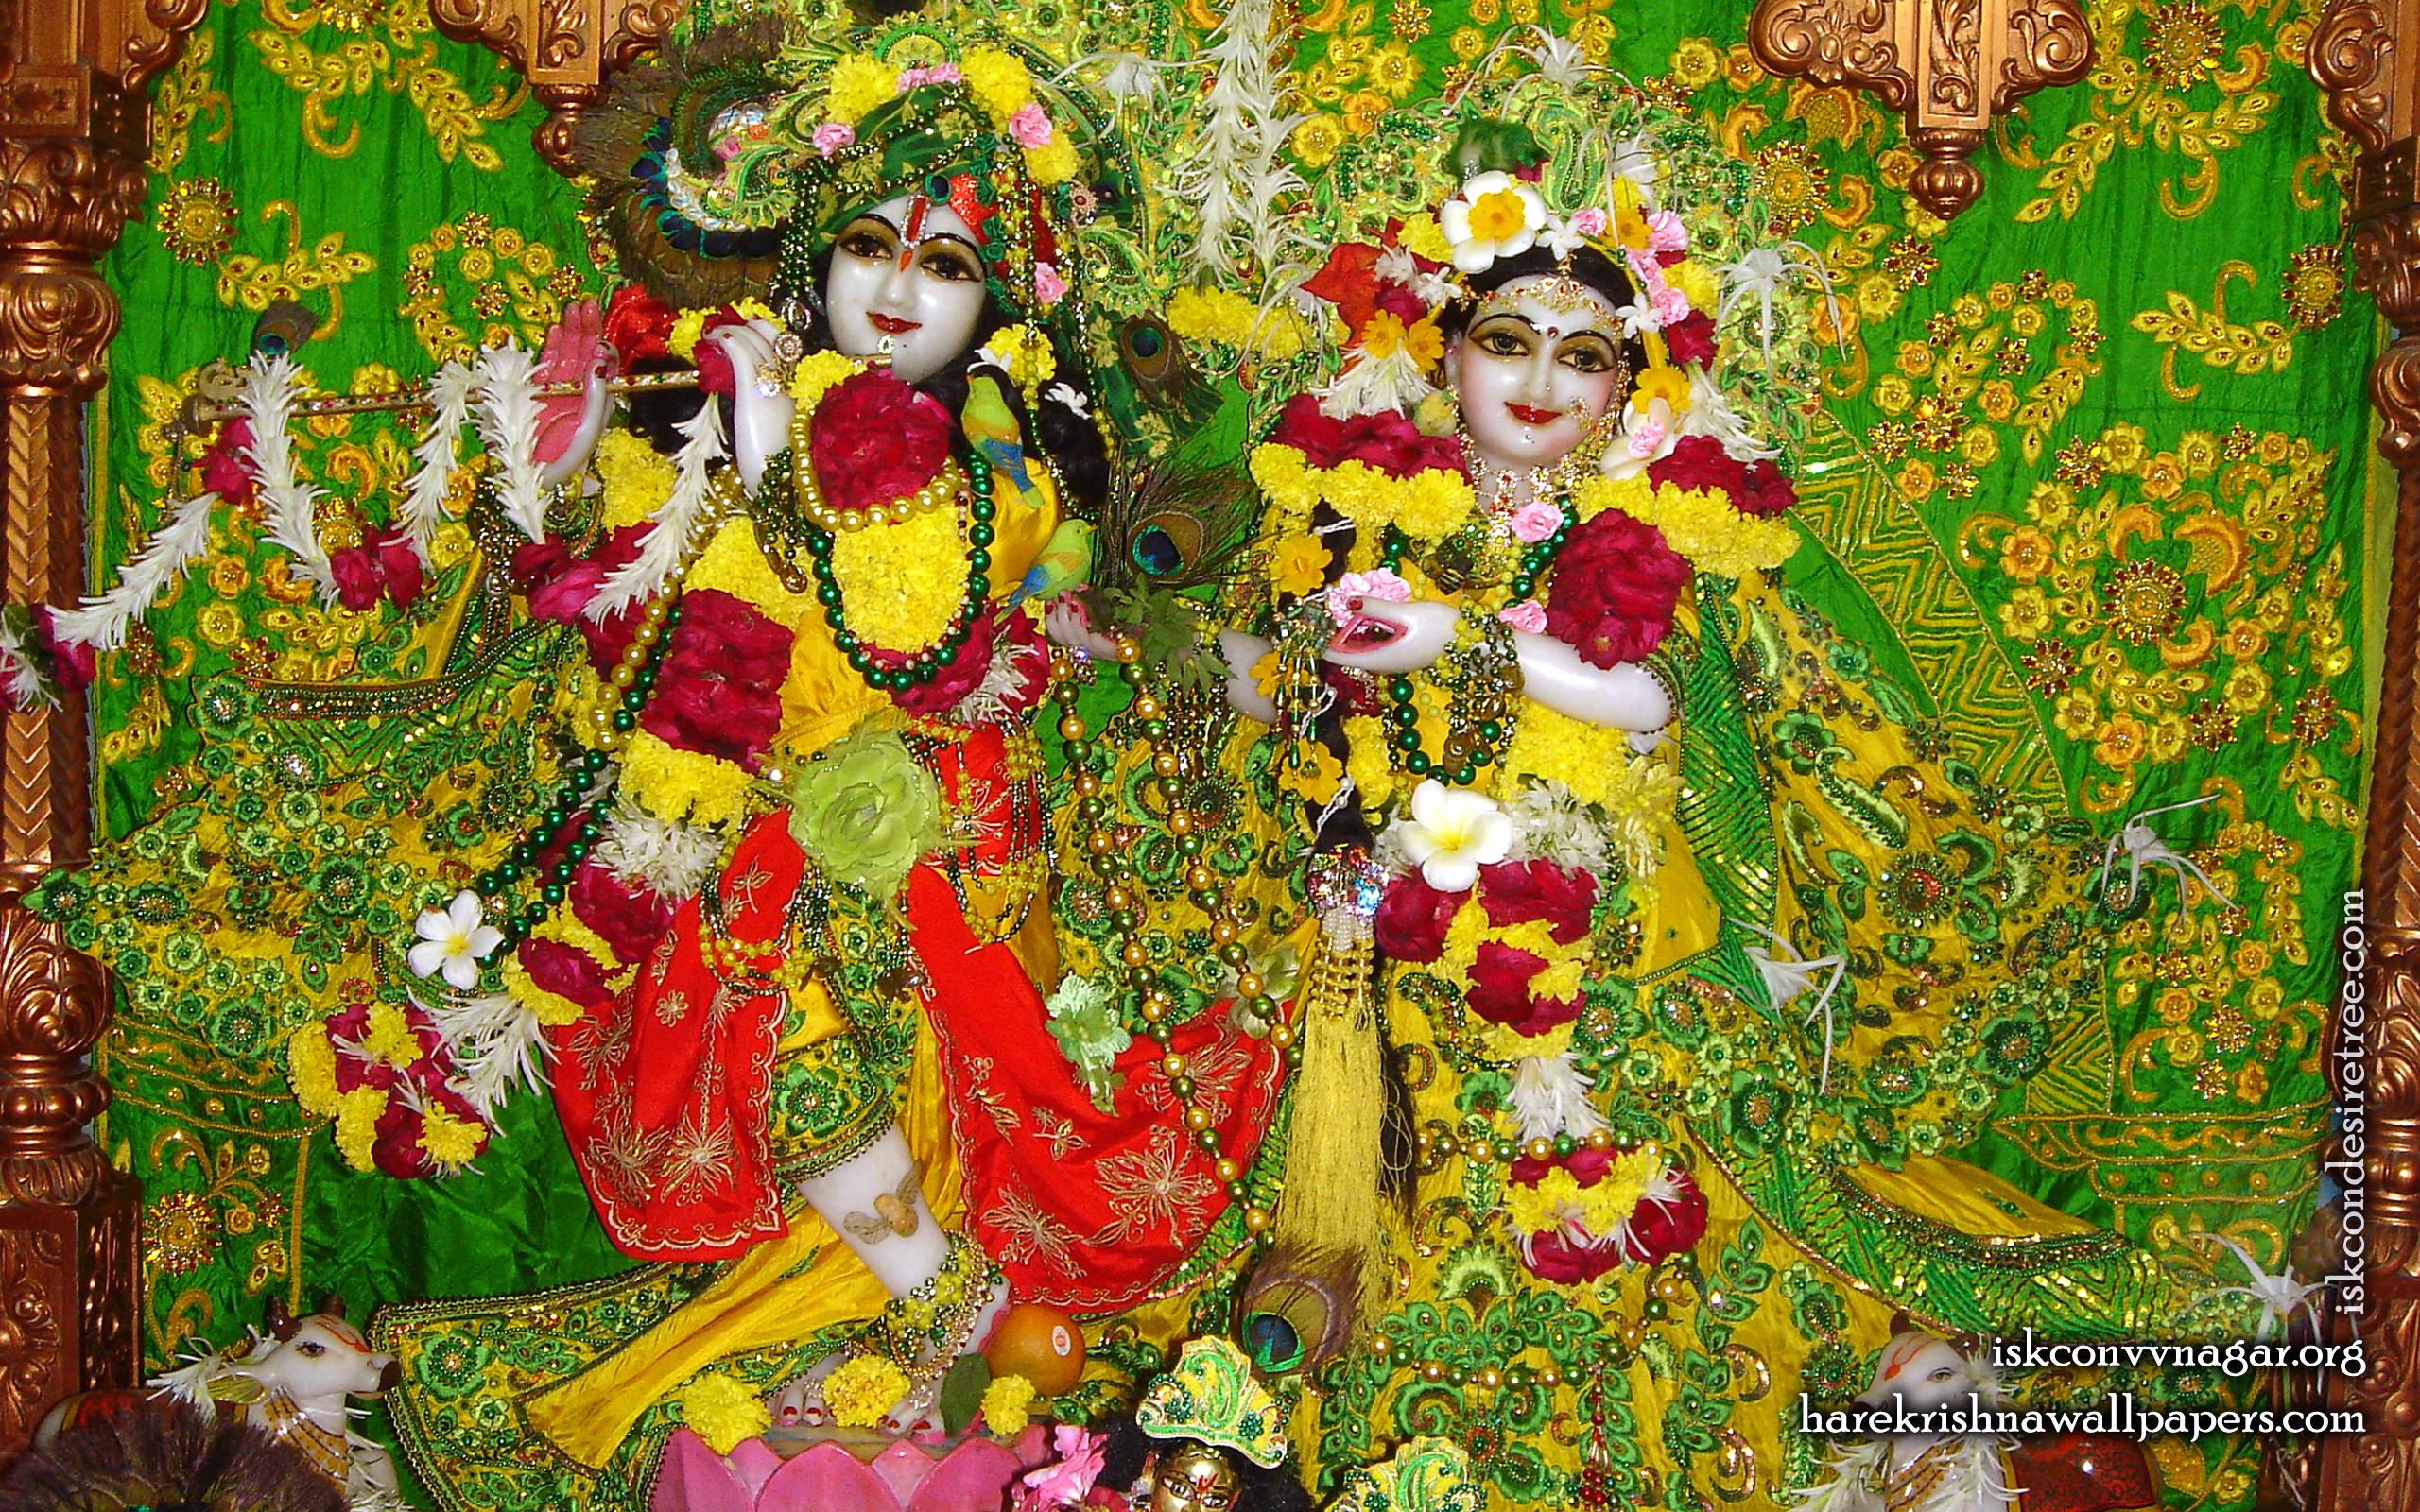 Sri Sri Radha Giridhari Wallpaper (011) Size 2560x1600 Download